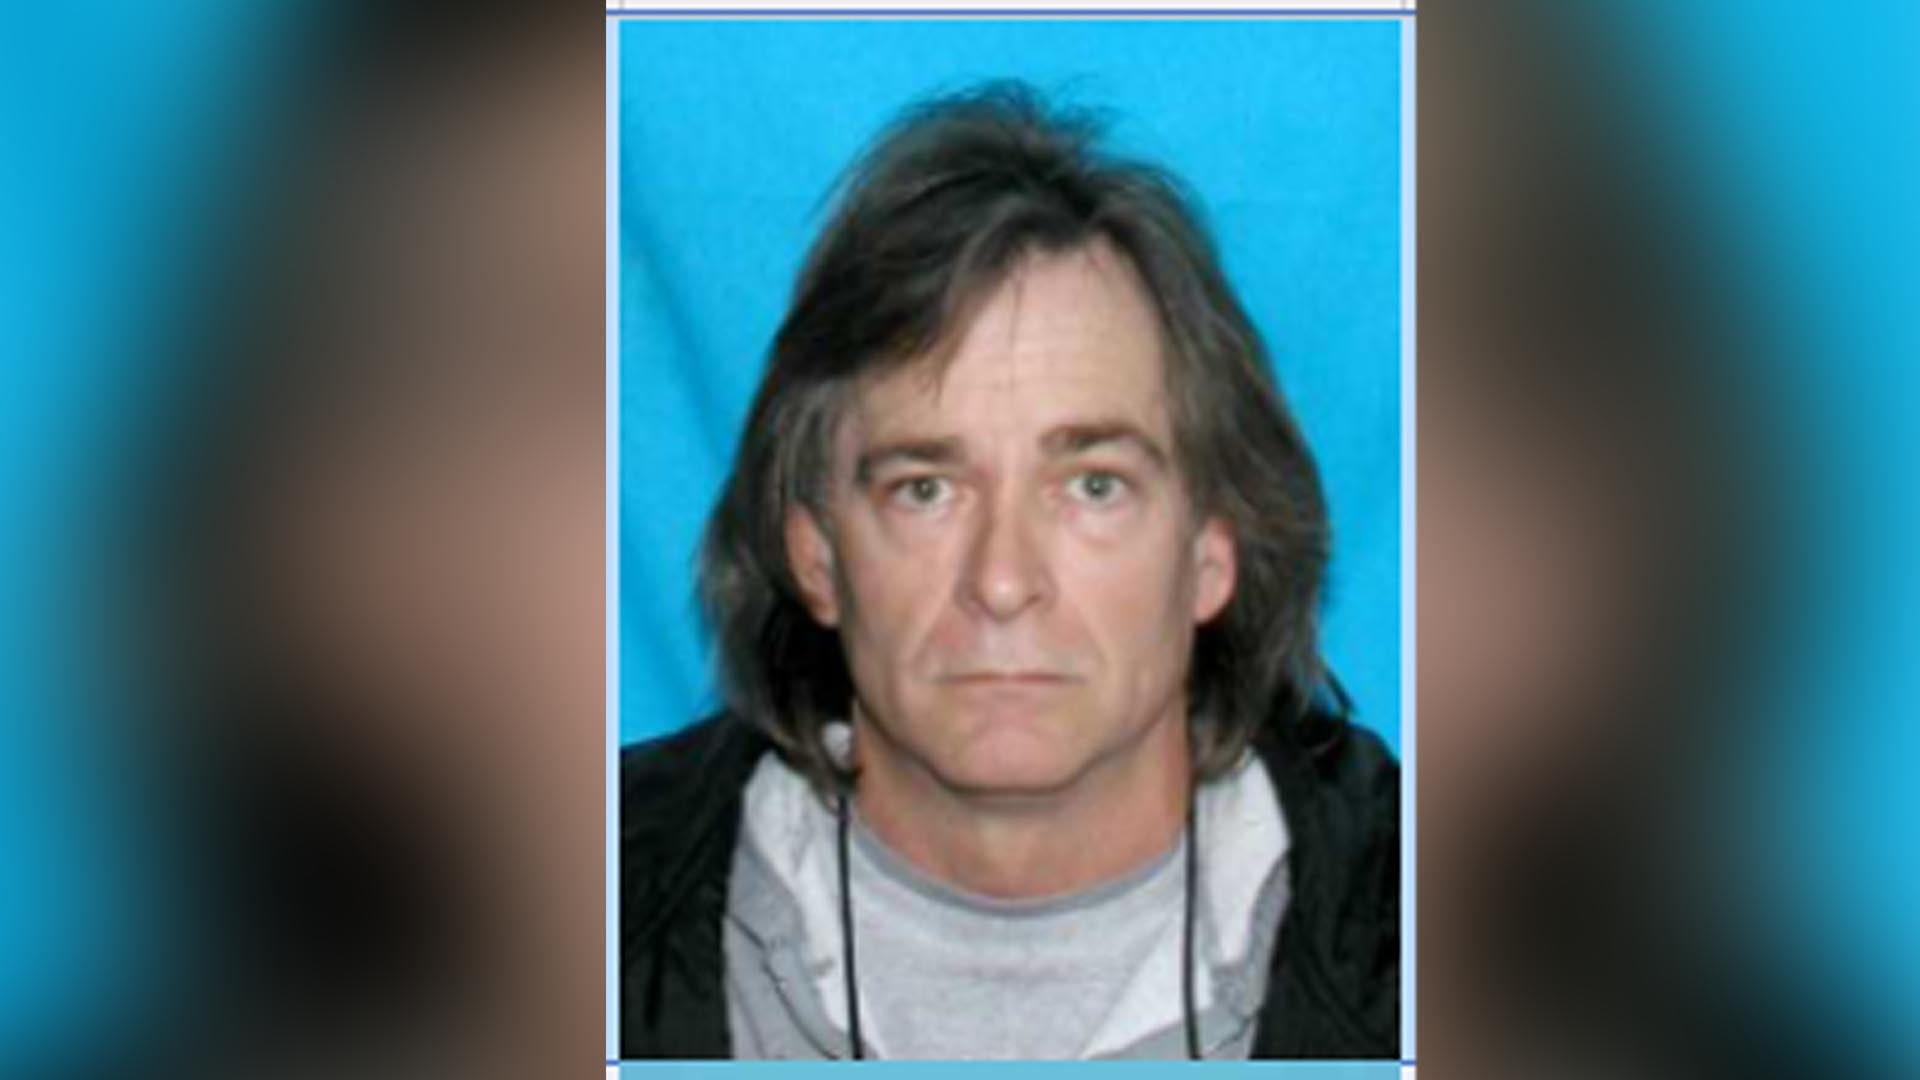 Suspected Nashville bomber identified